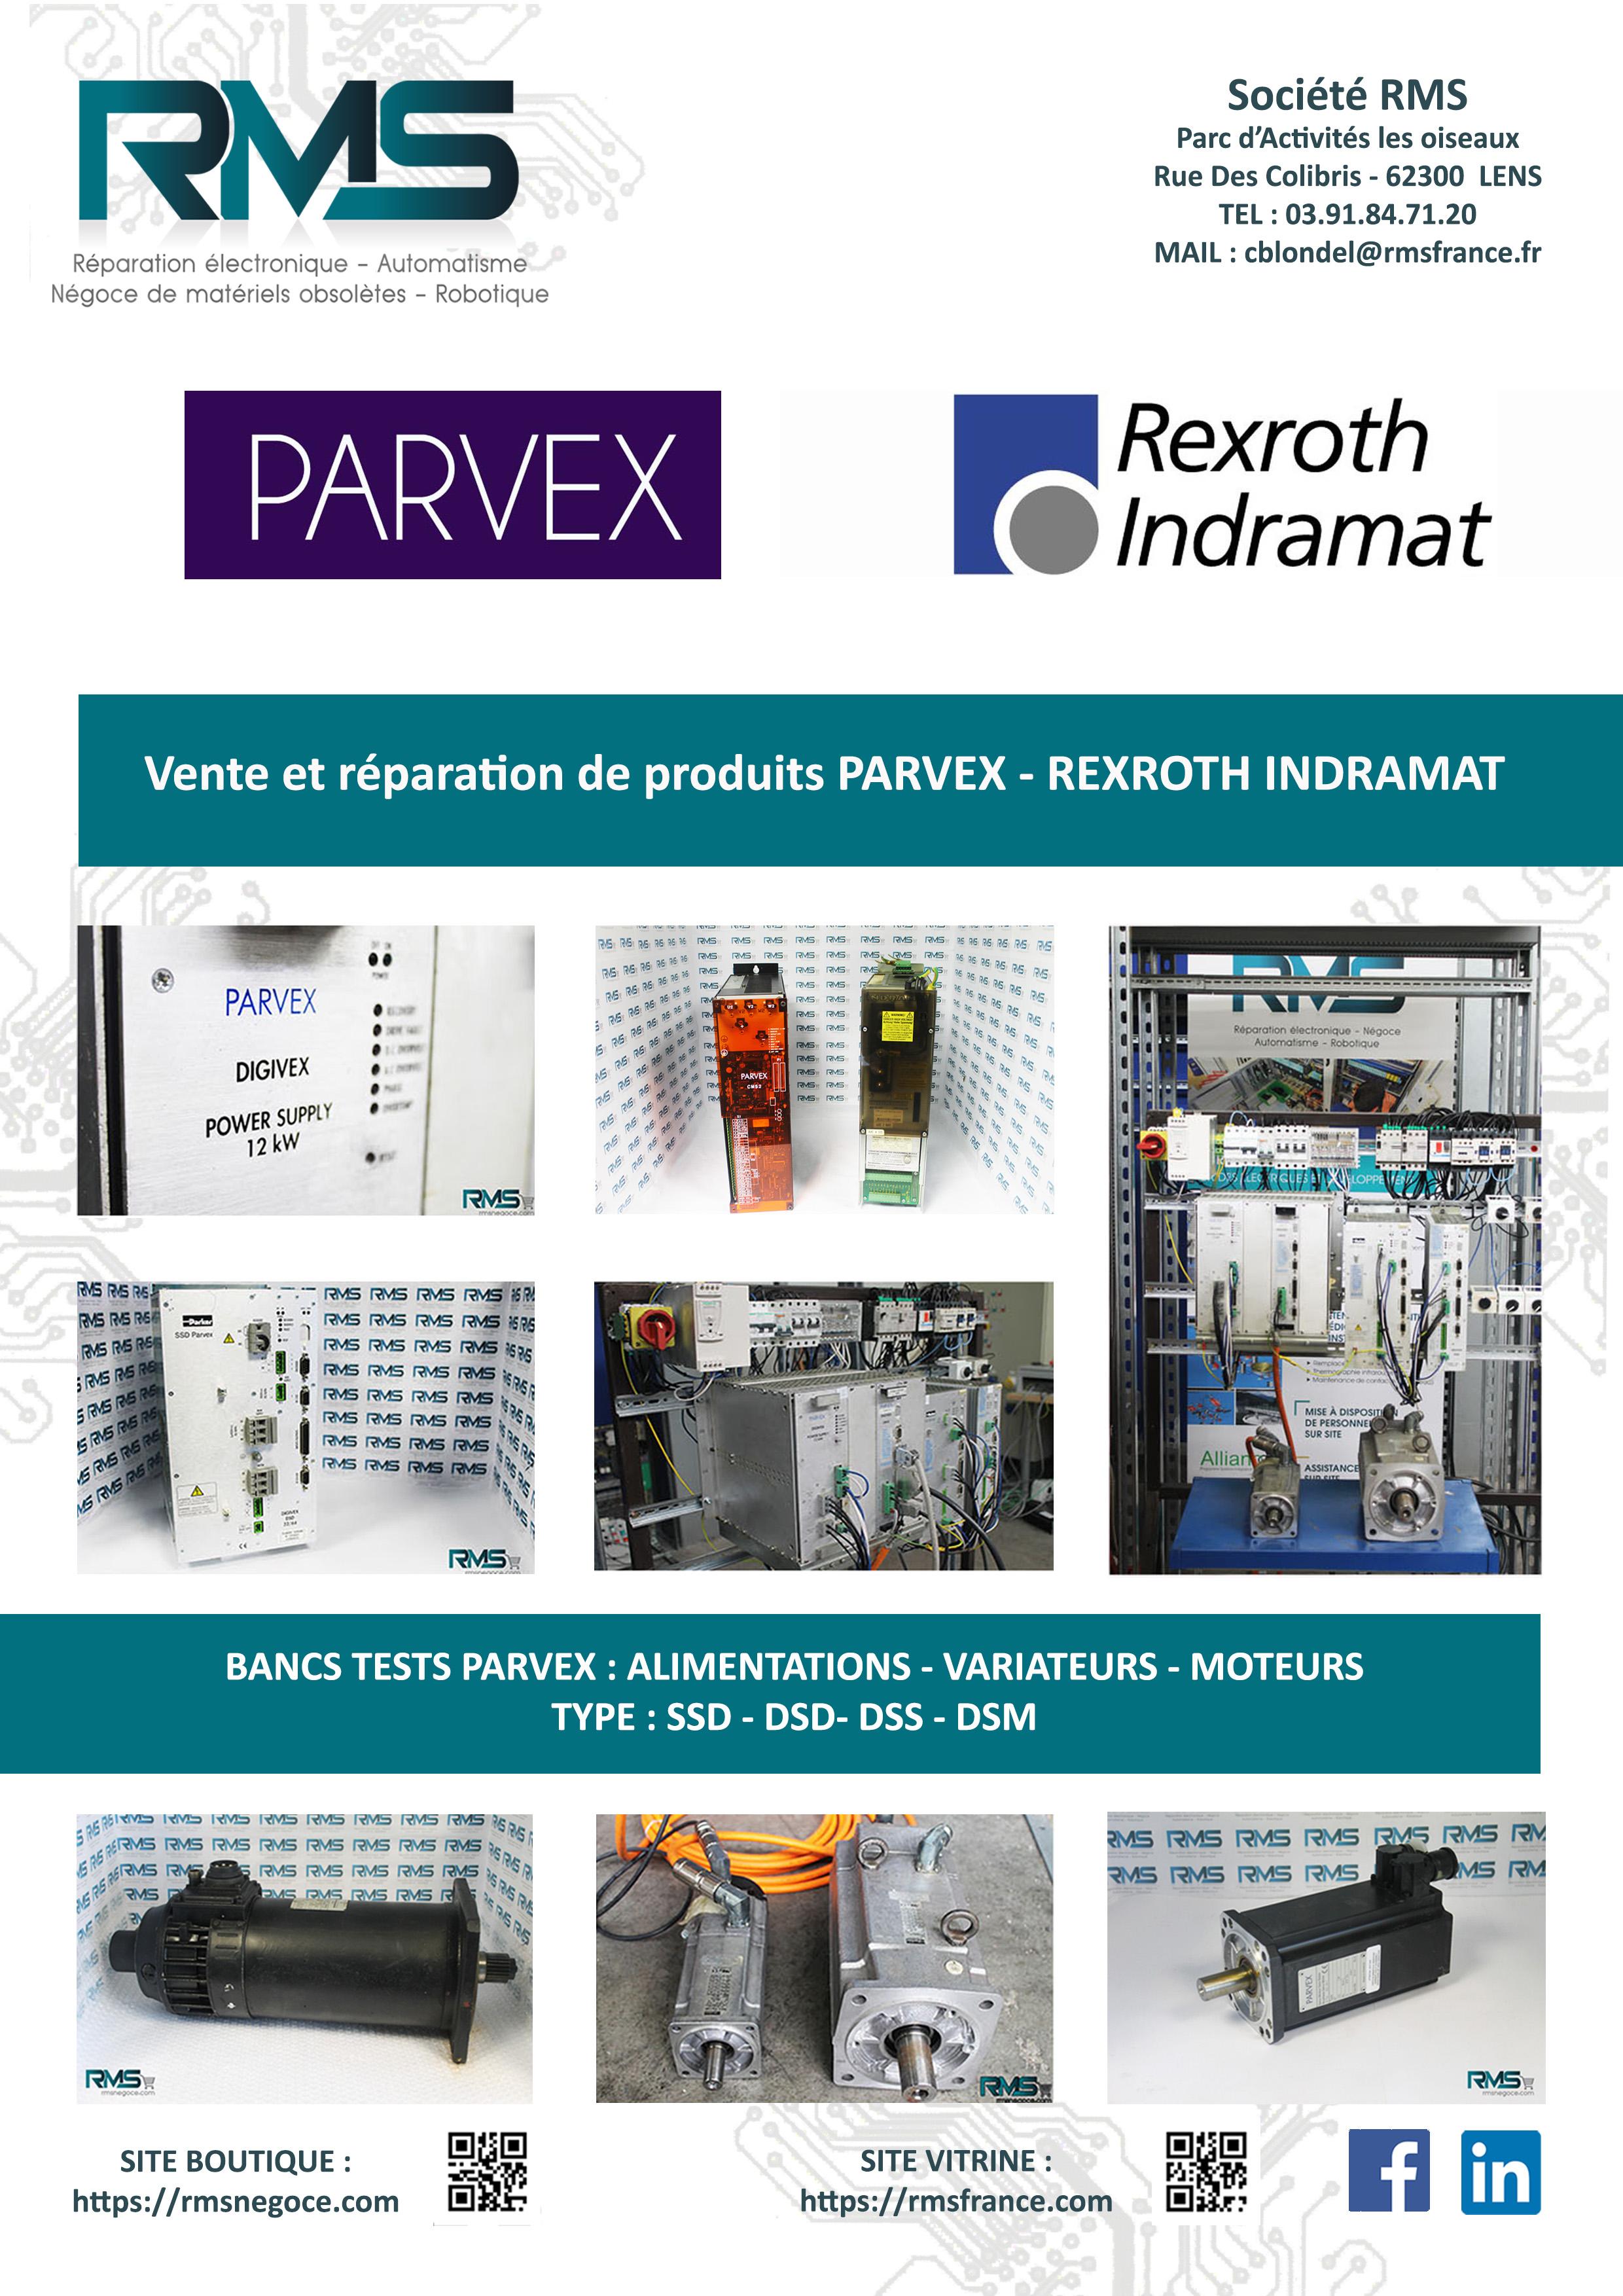 PARVEX REXROTH